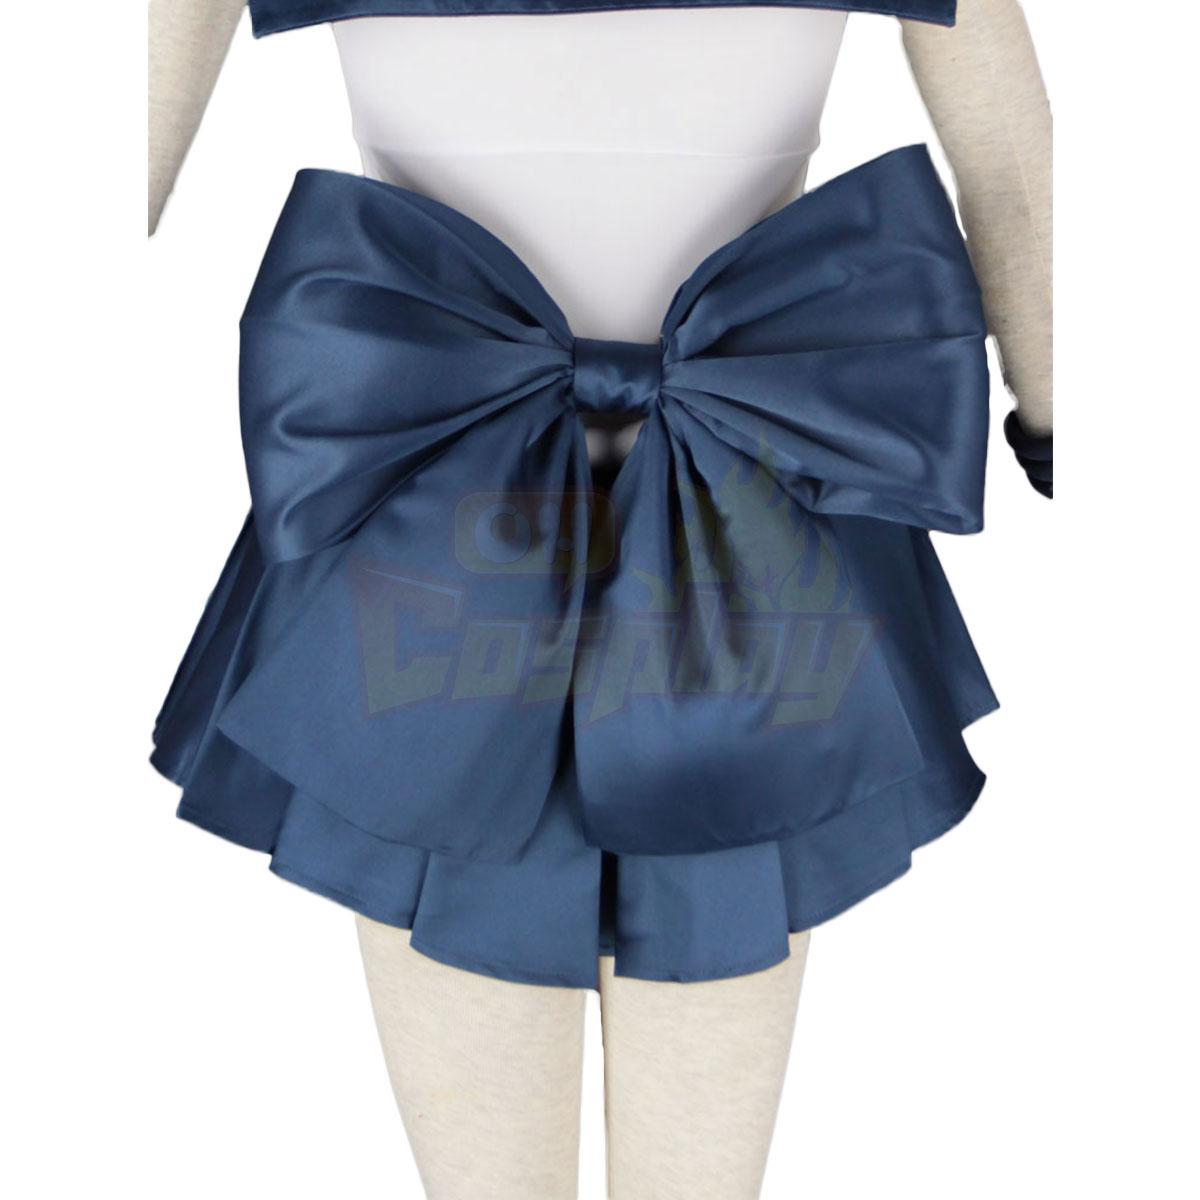 Sailor Moon Tenoh Haruka 1ST Cosplay Costumes Deluxe Edition